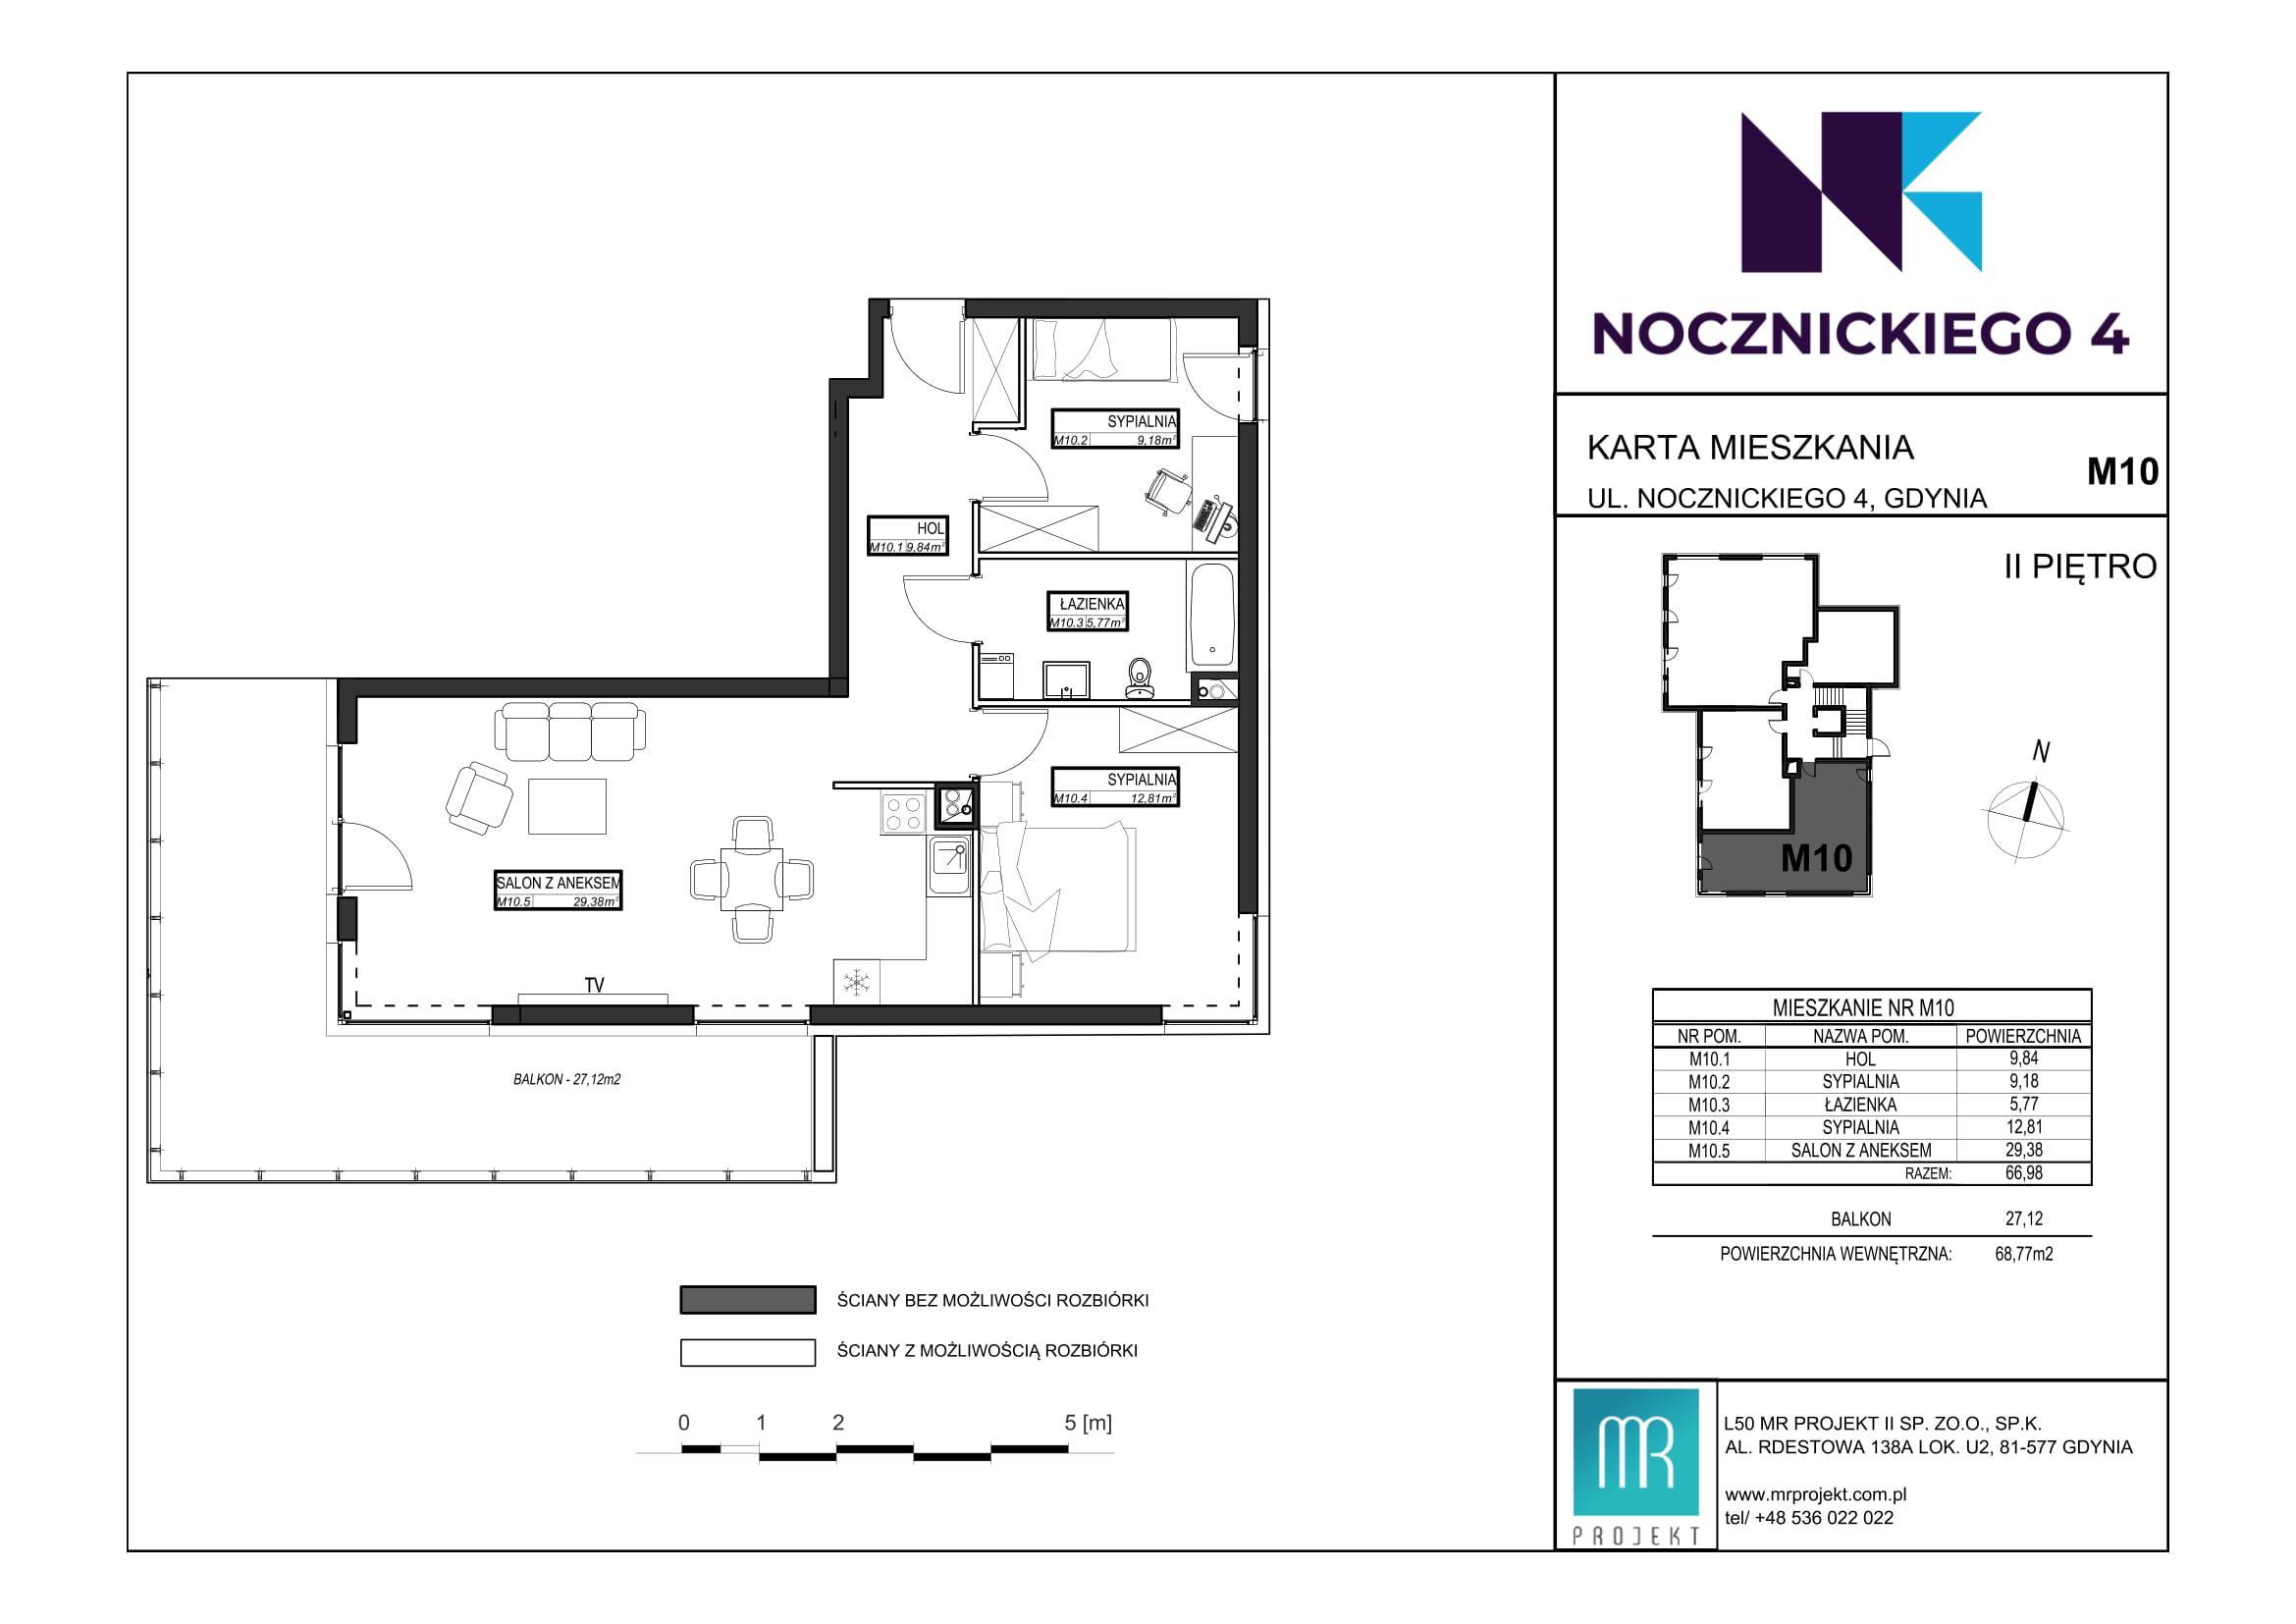 Rzut mieszkania M10